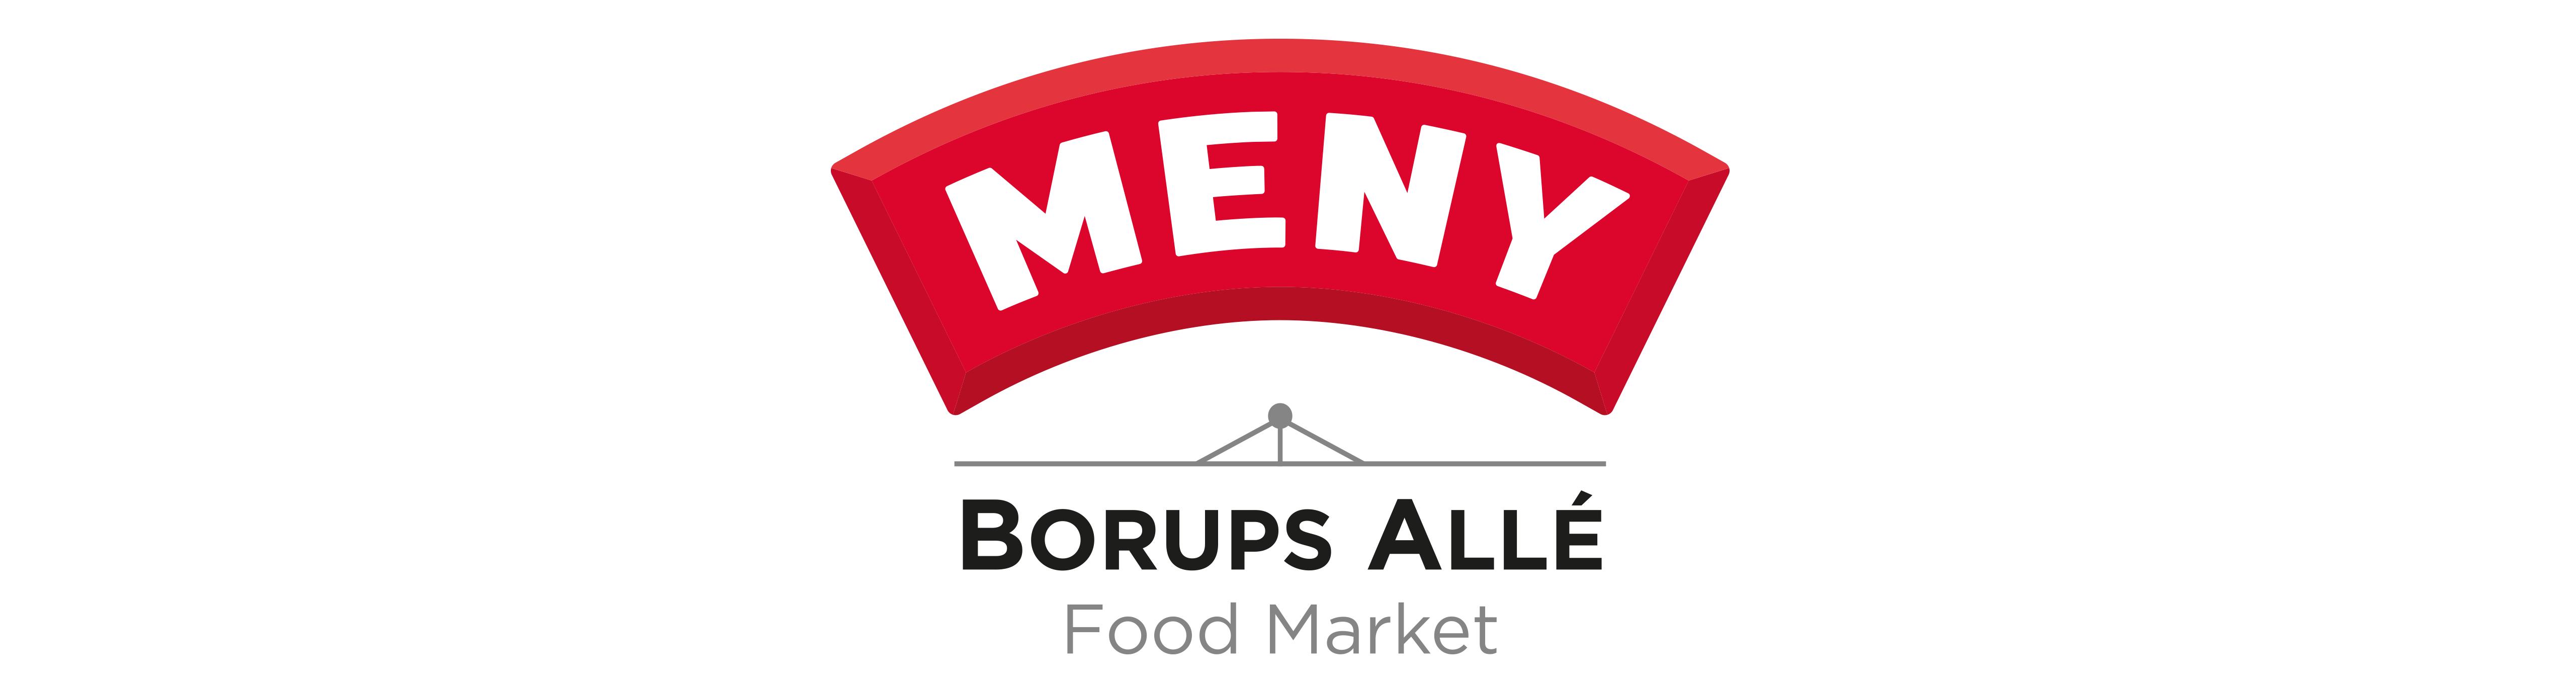 MENY Borups Allé